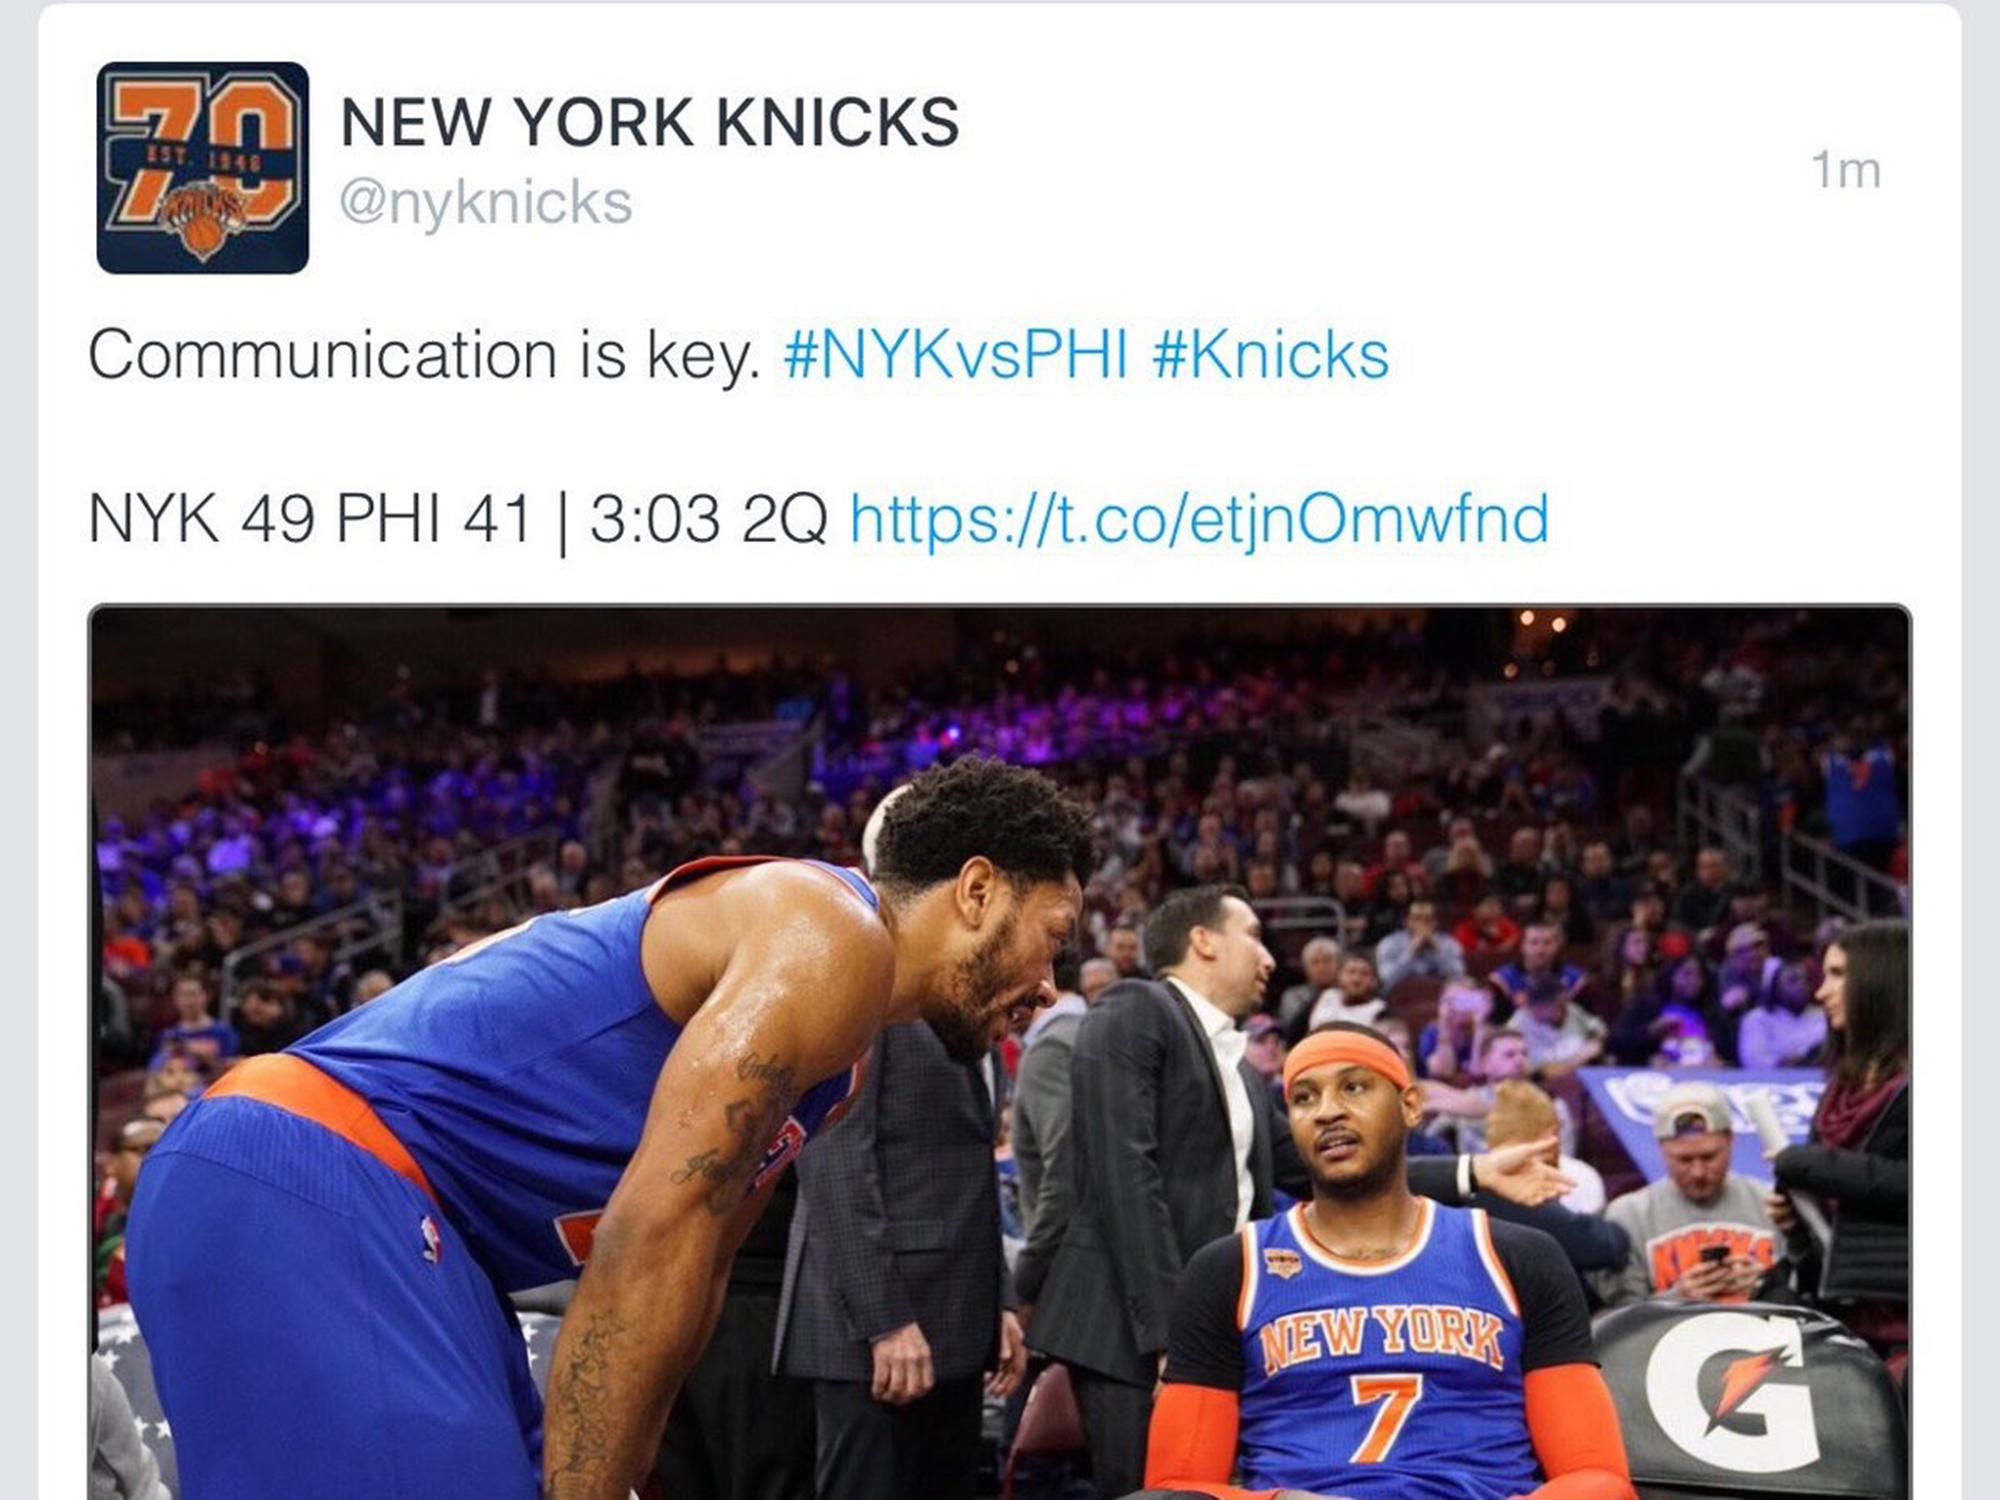 Knicks tweet